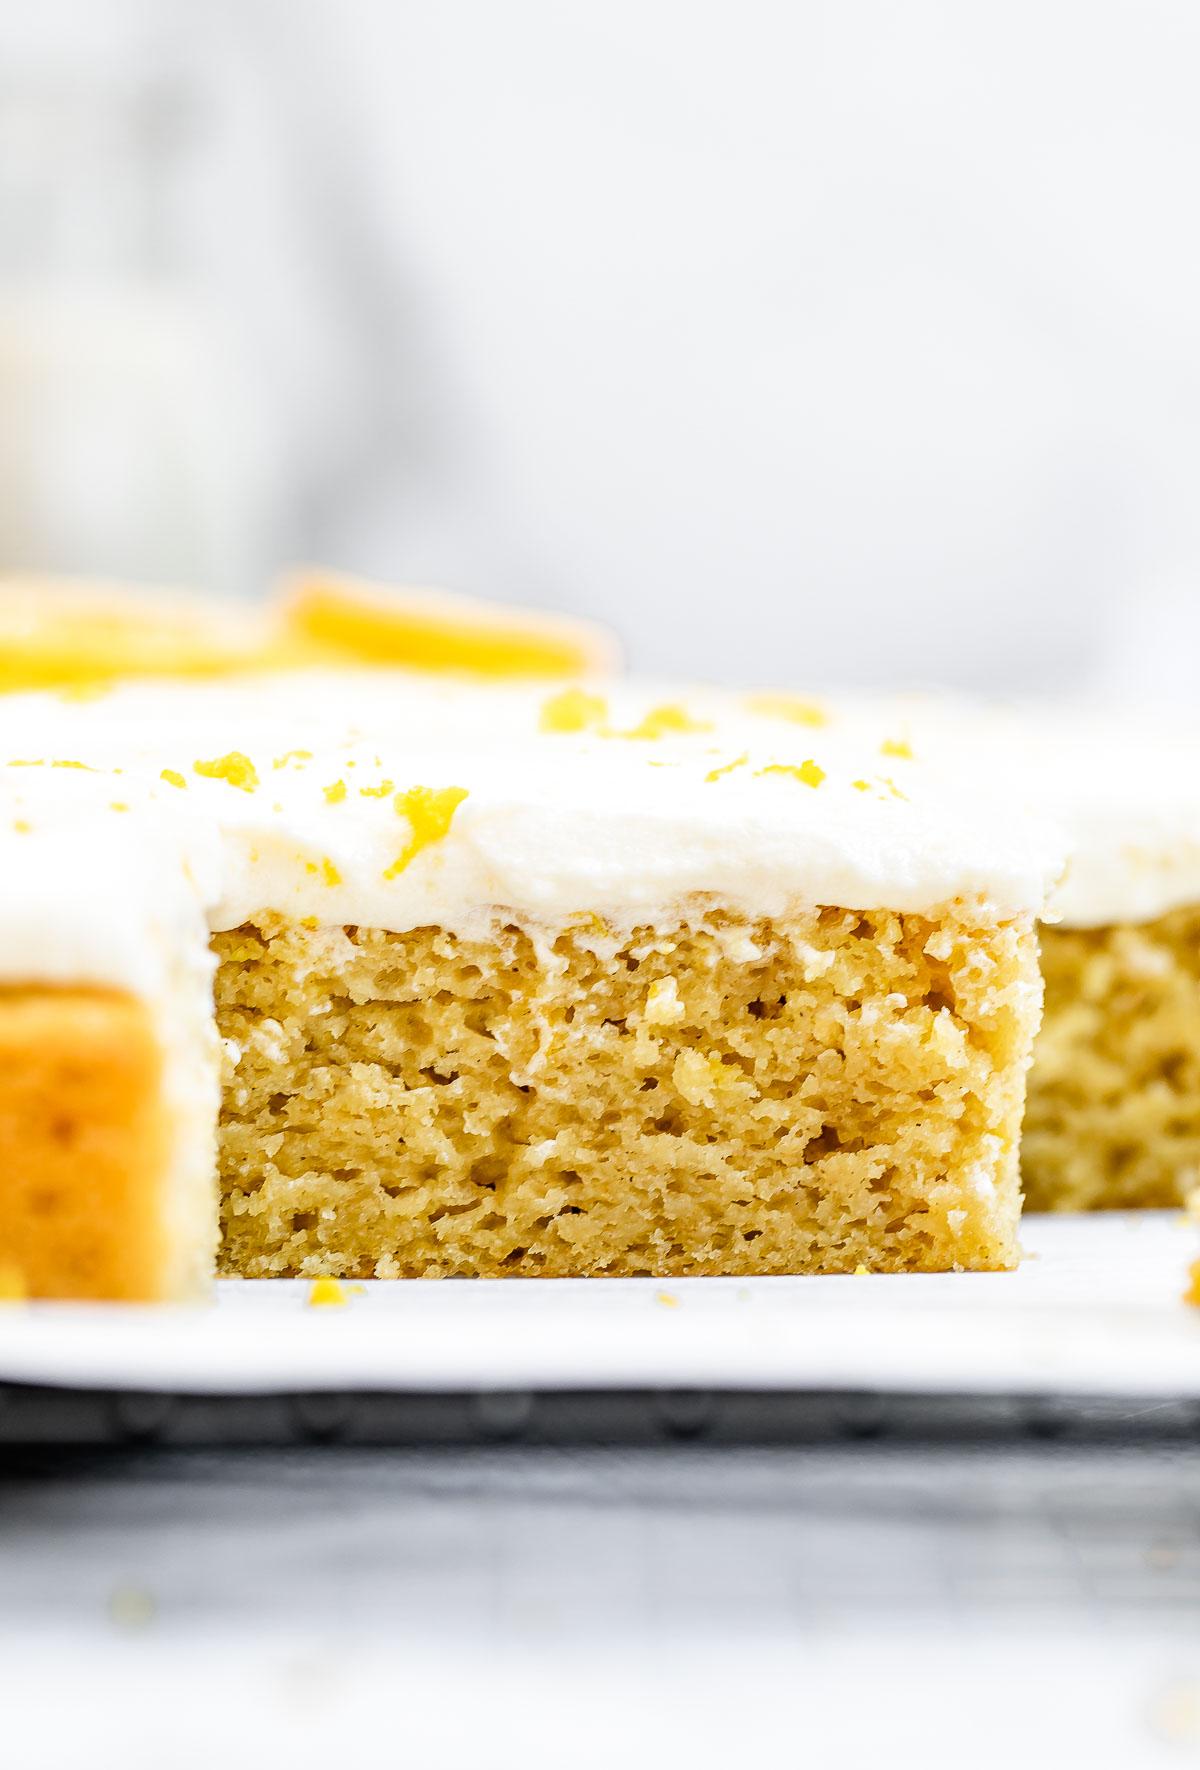 lemon sheet cake with lemon wedges on top